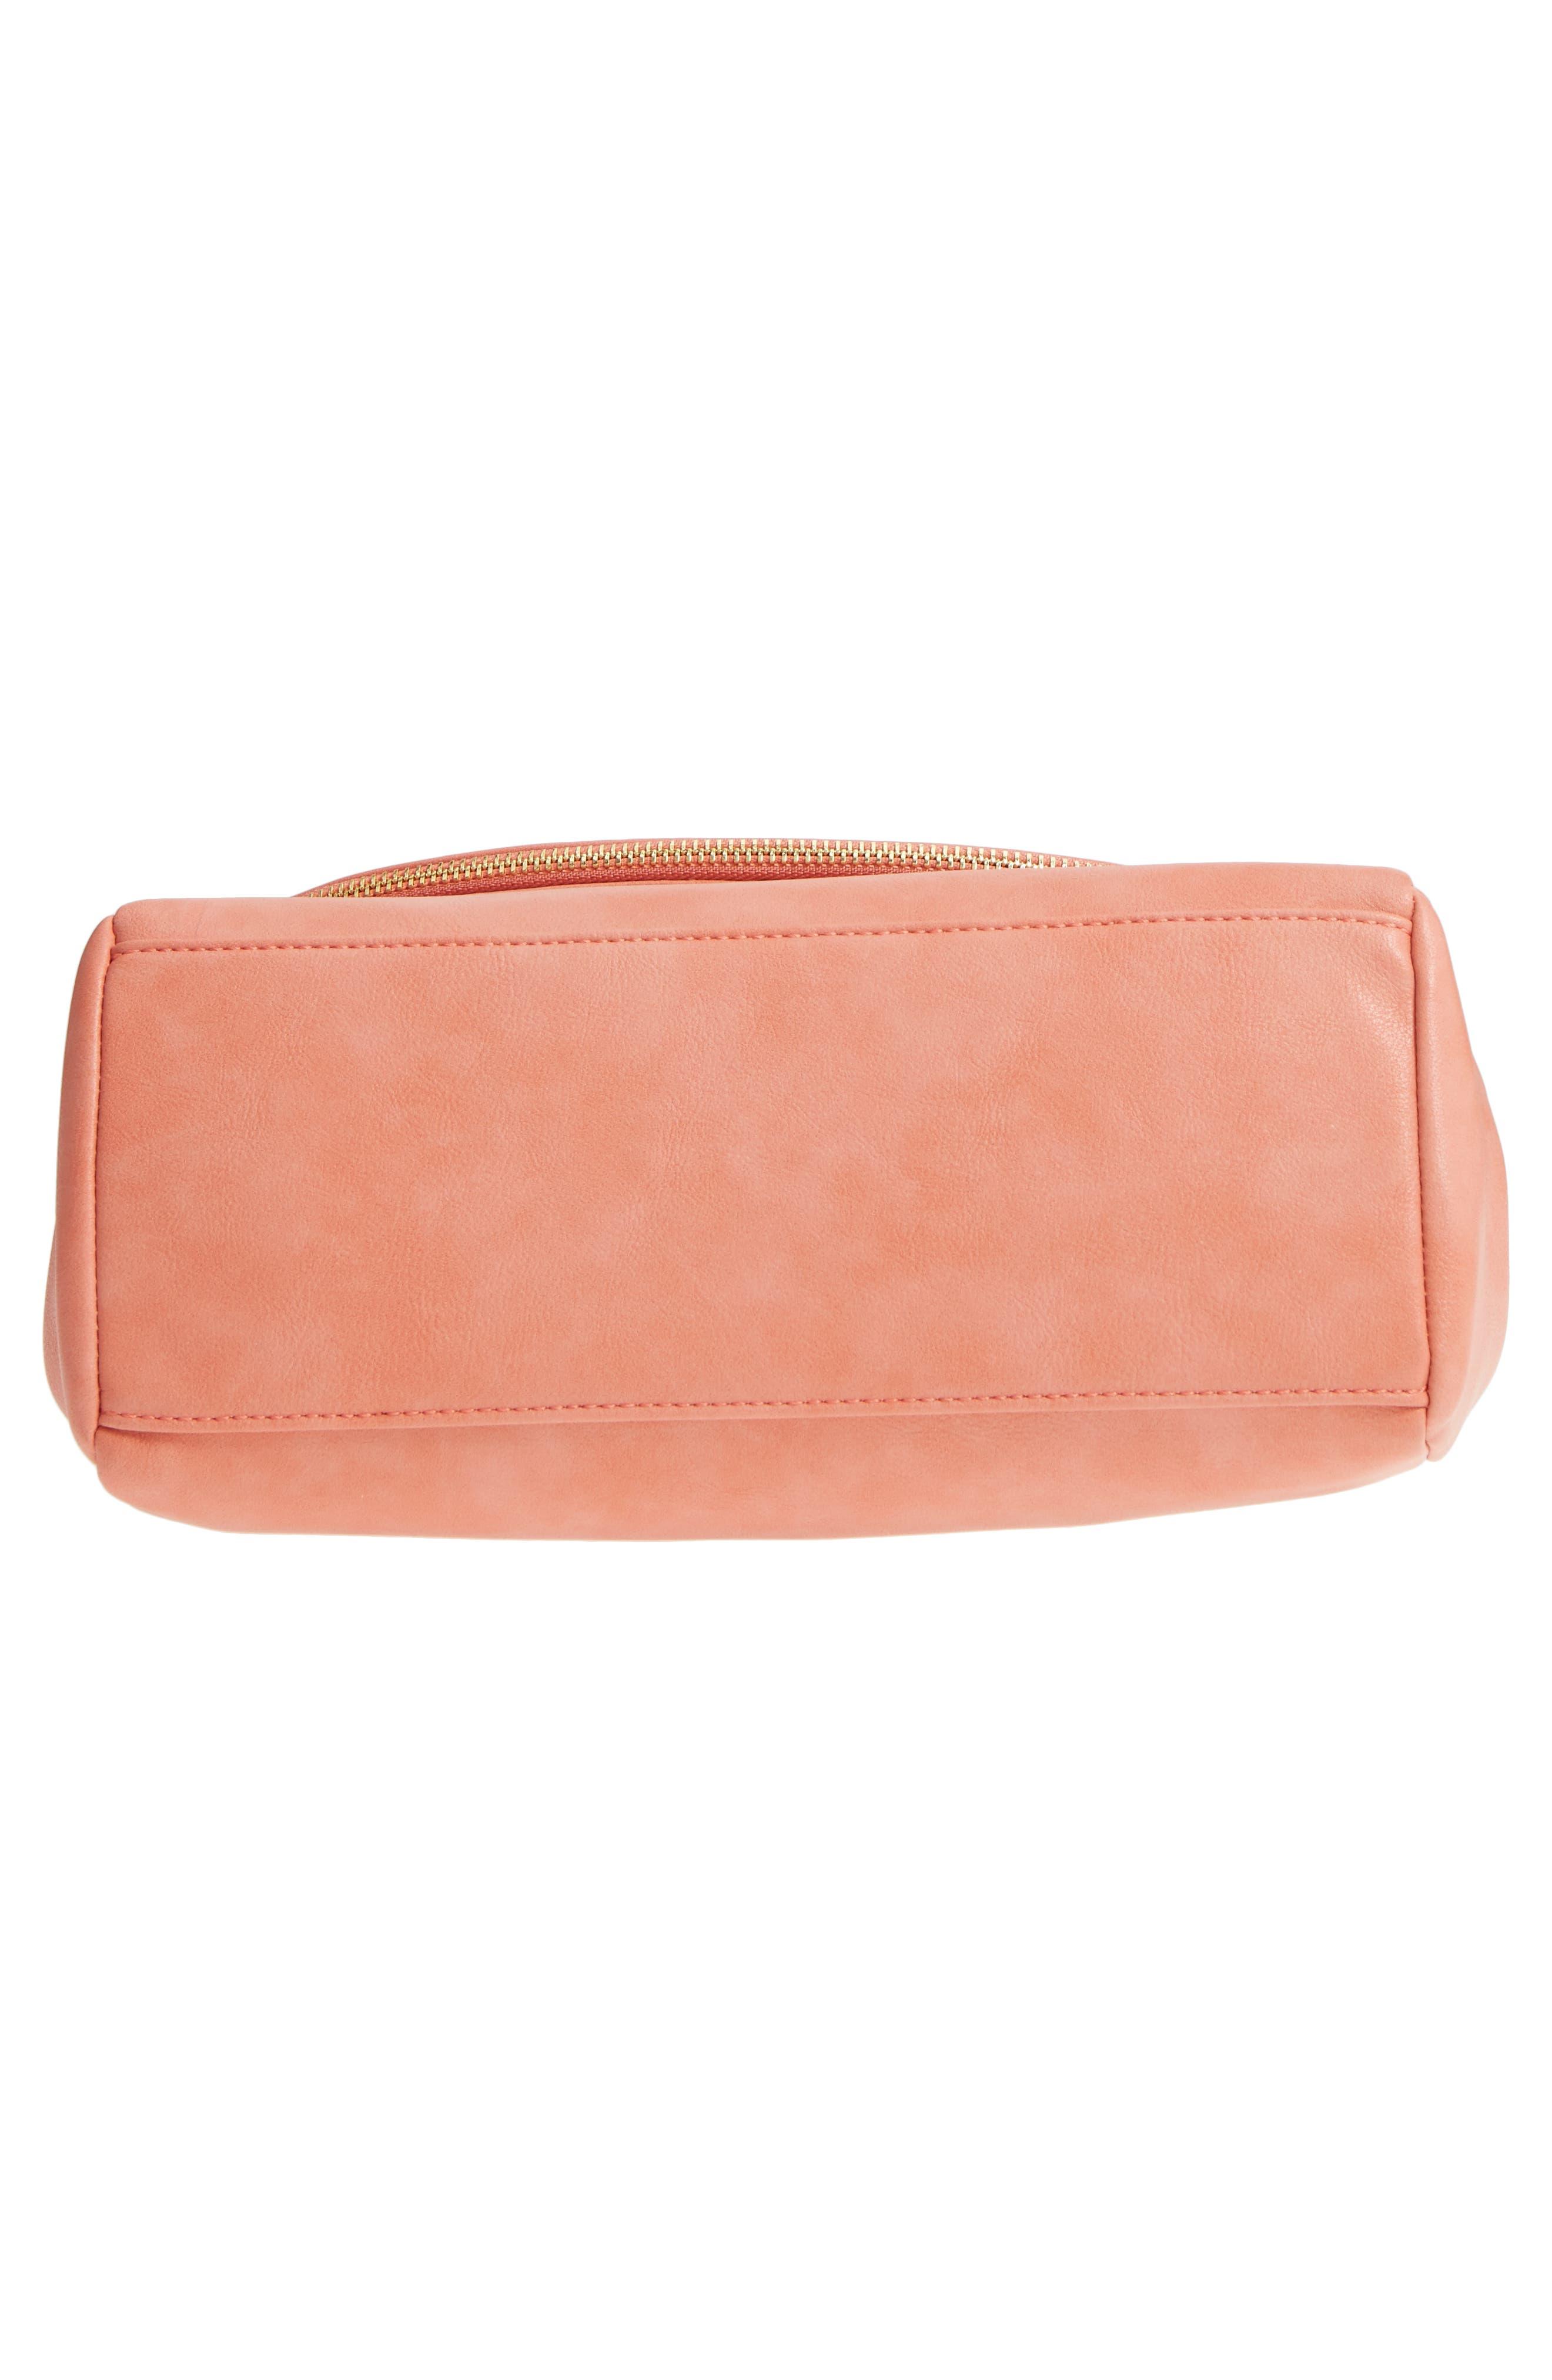 ,                             Top Handle Faux Leather Crossbody Bag,                             Alternate thumbnail 24, color,                             950